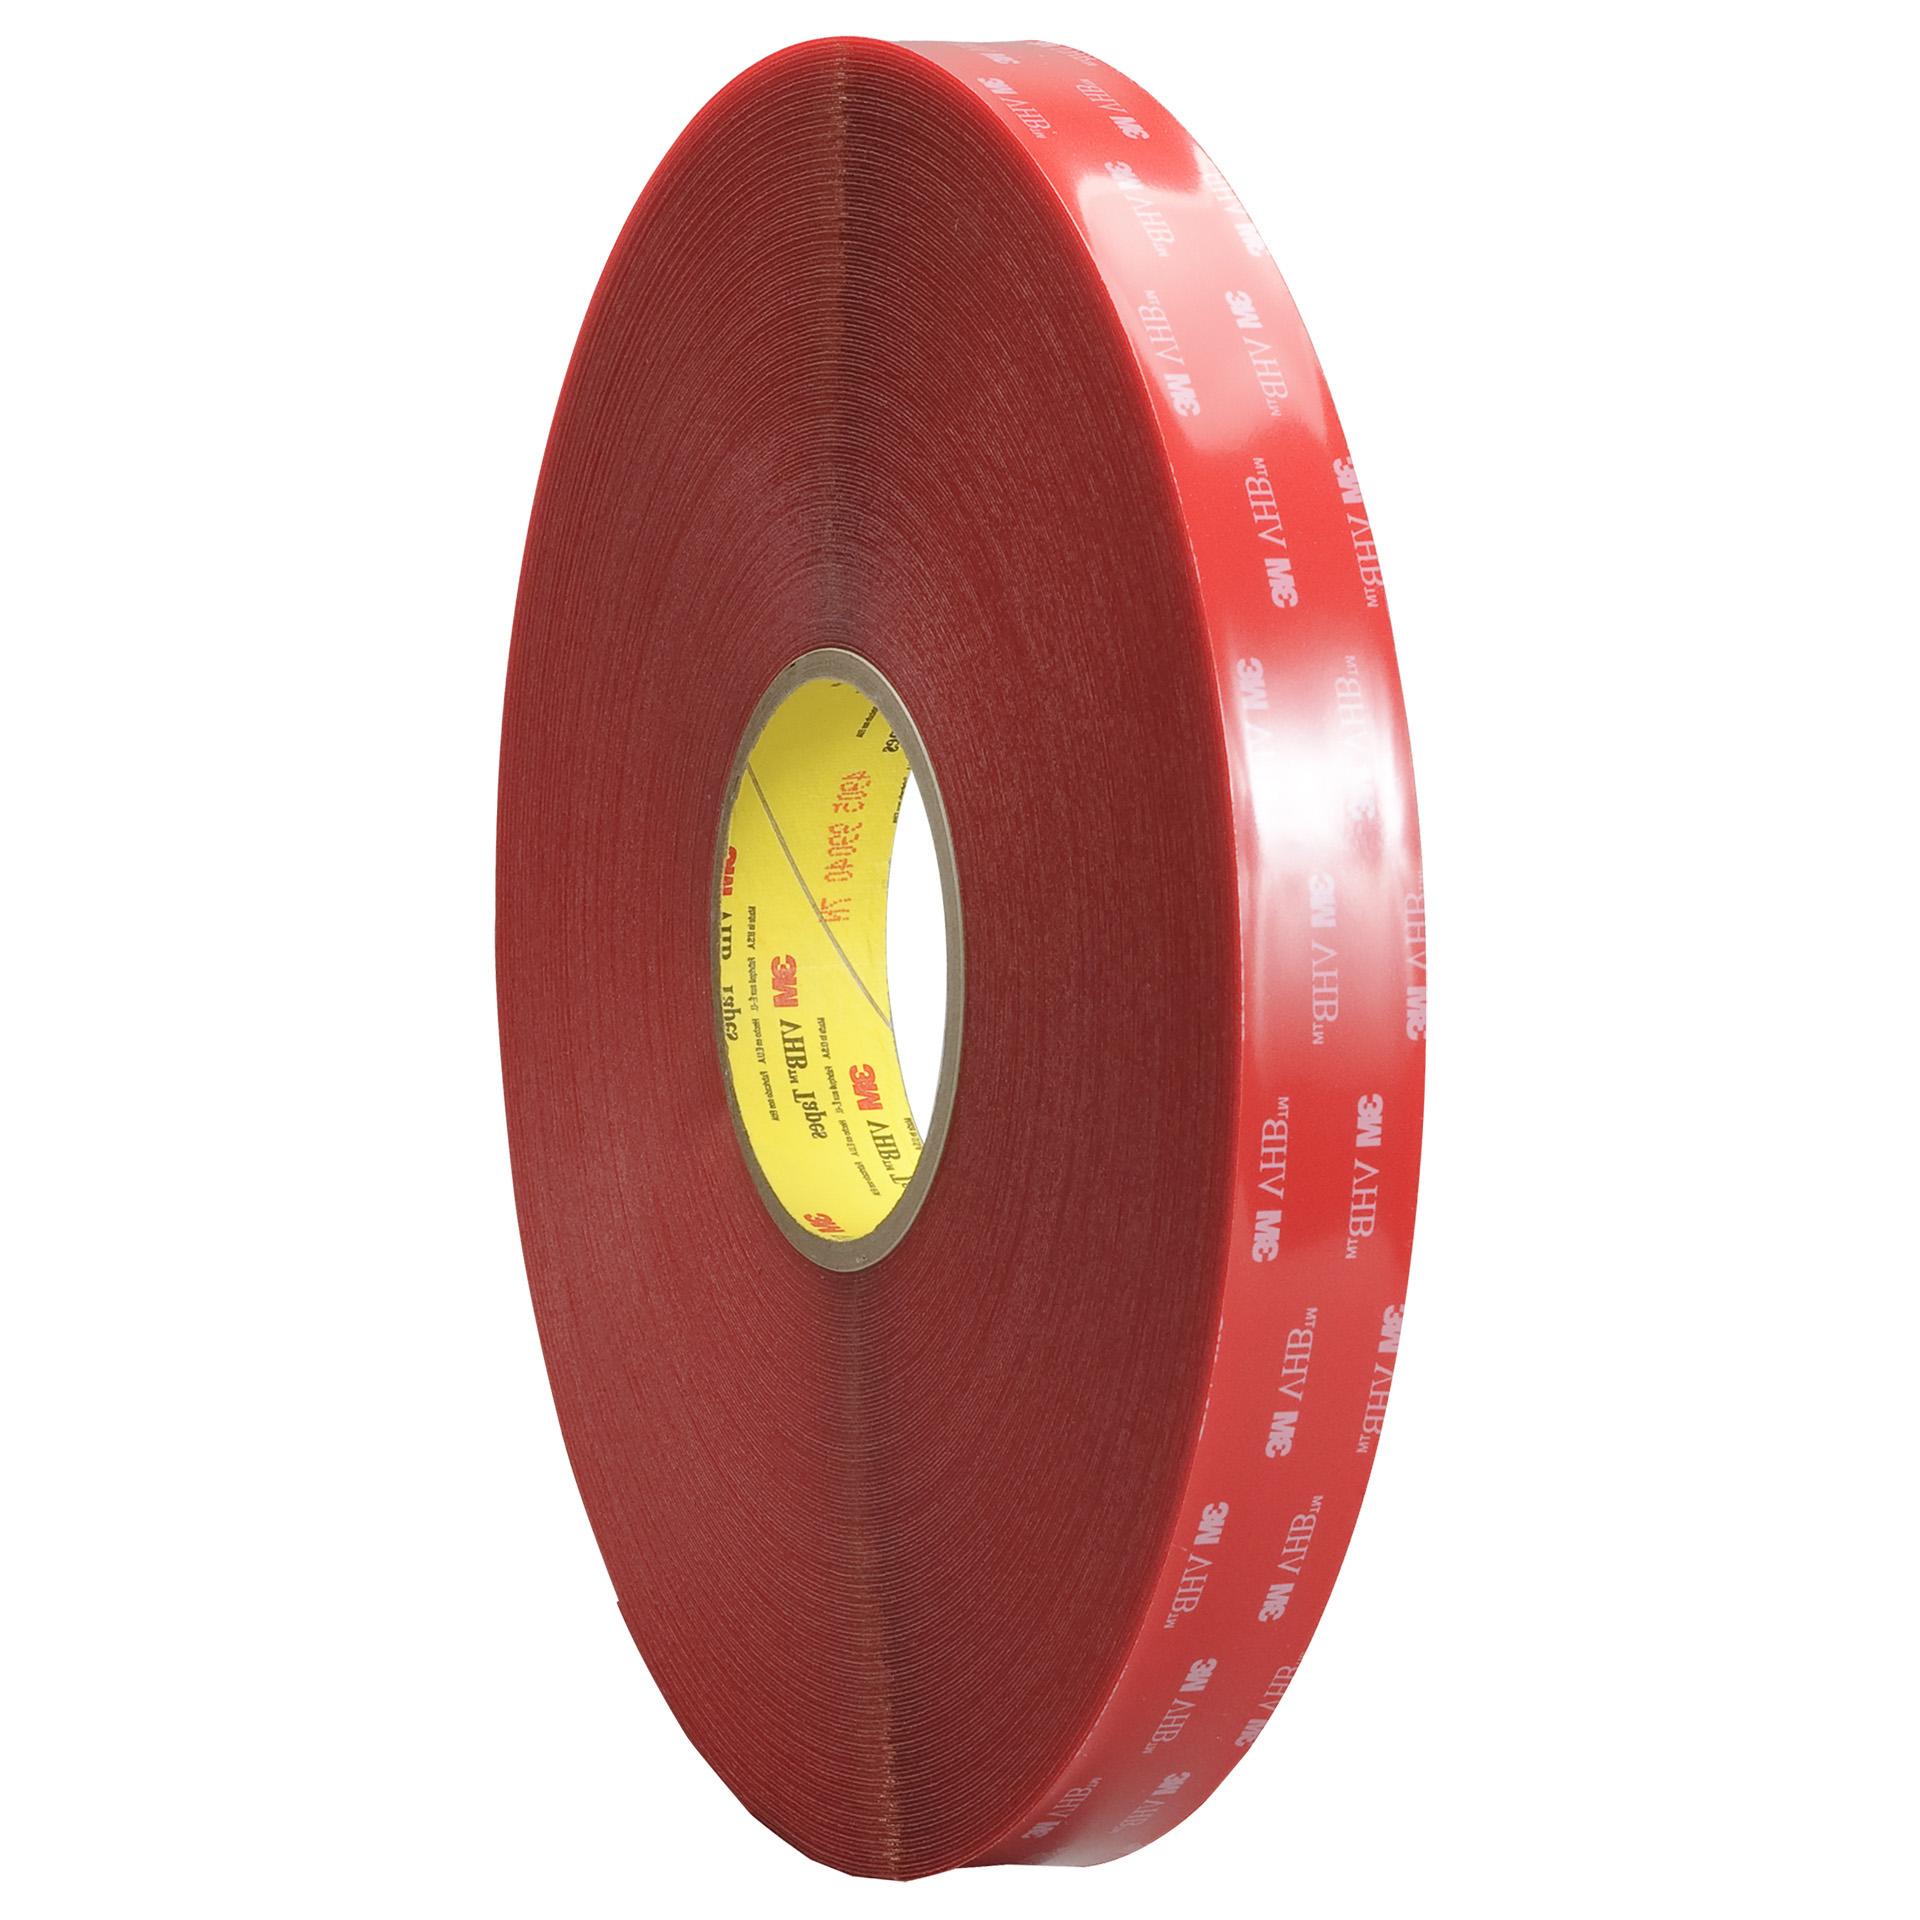 3MVHB tape